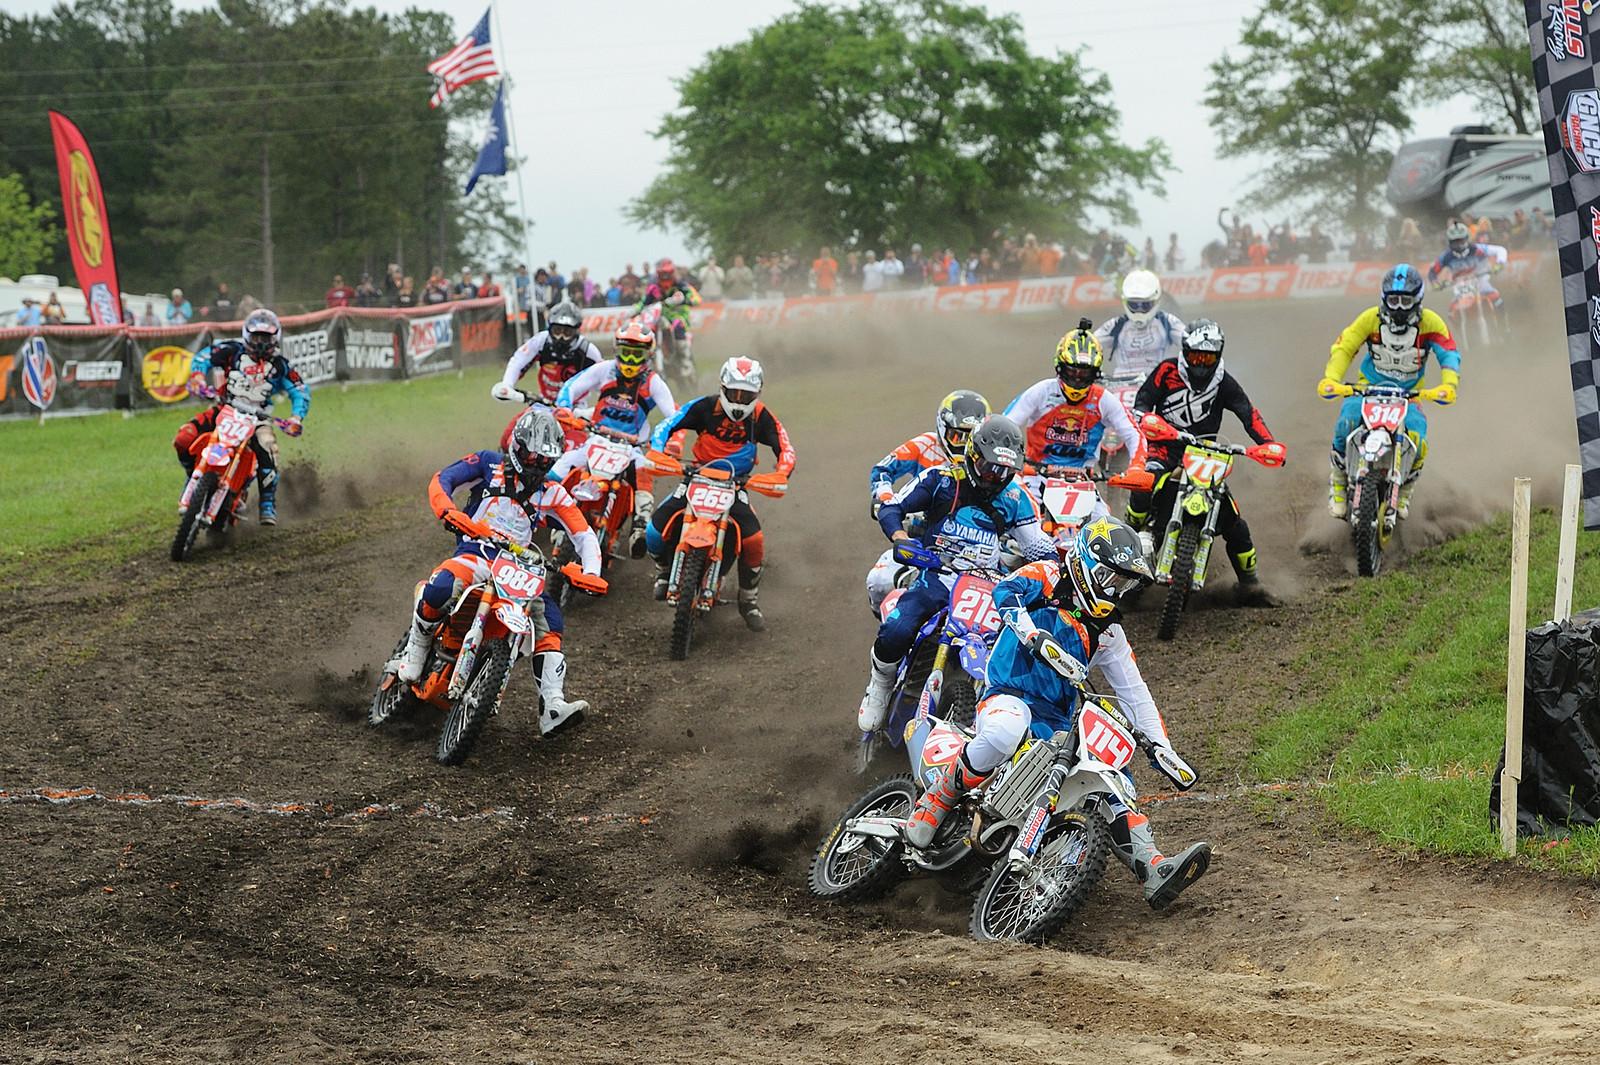 Josh Strang - GuyB - Motocross Pictures - Vital MX